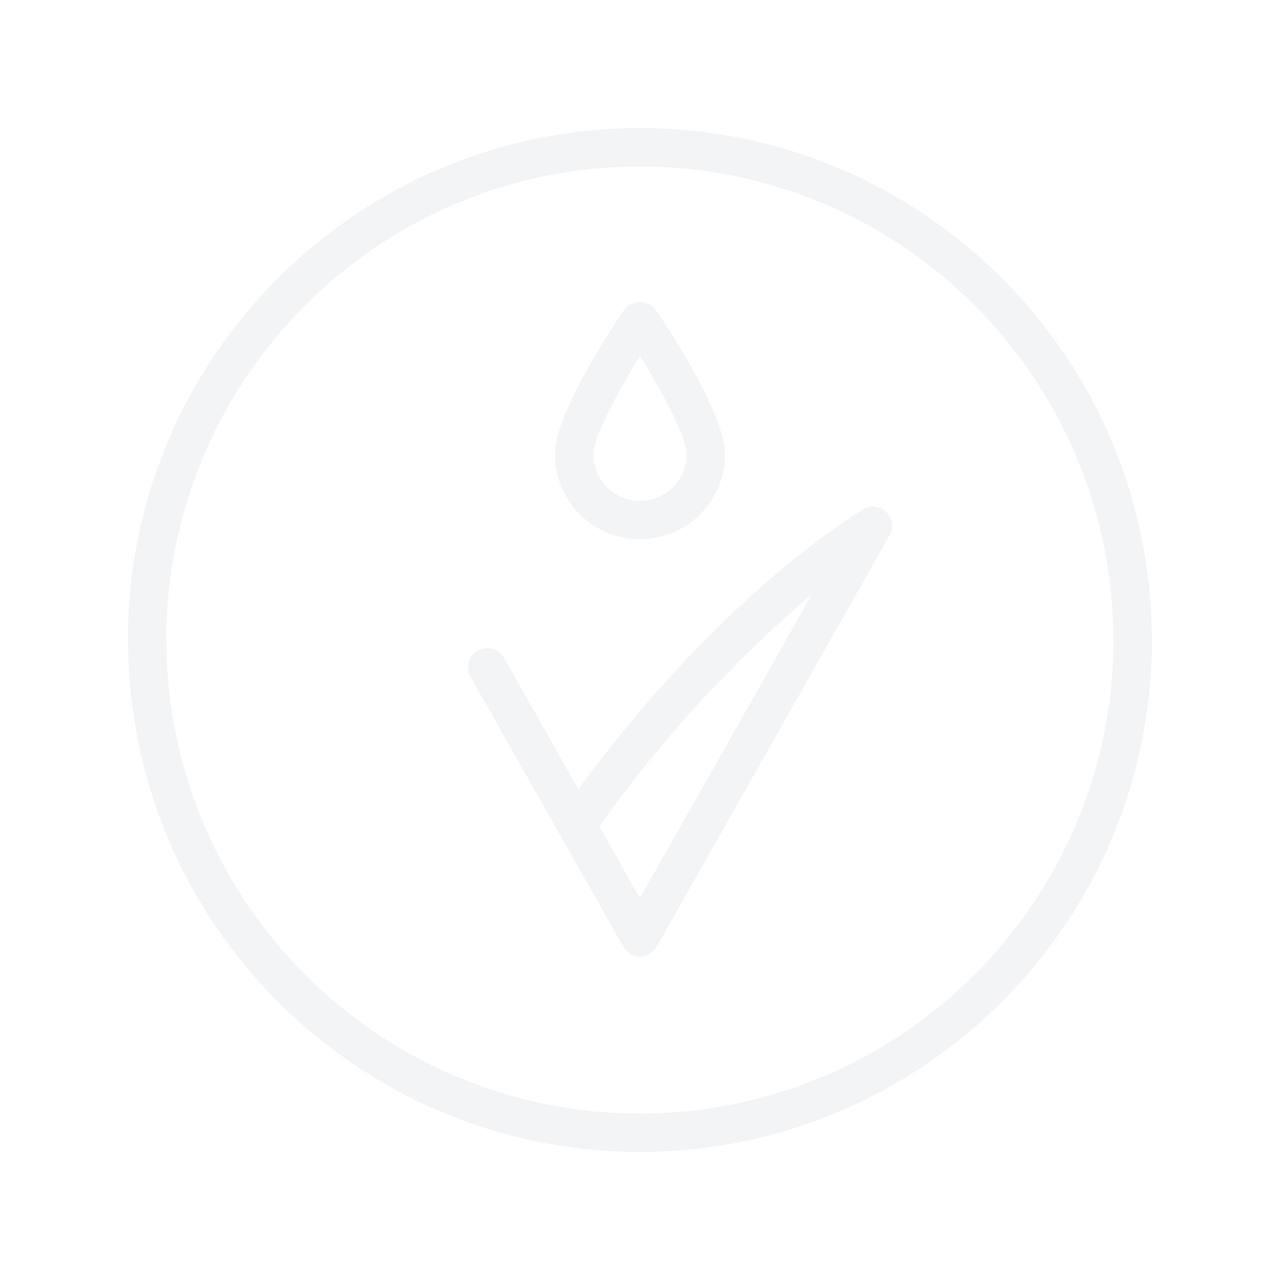 MISSHA Time Revolution Blooming Tone Up Bridal Cream 50ml